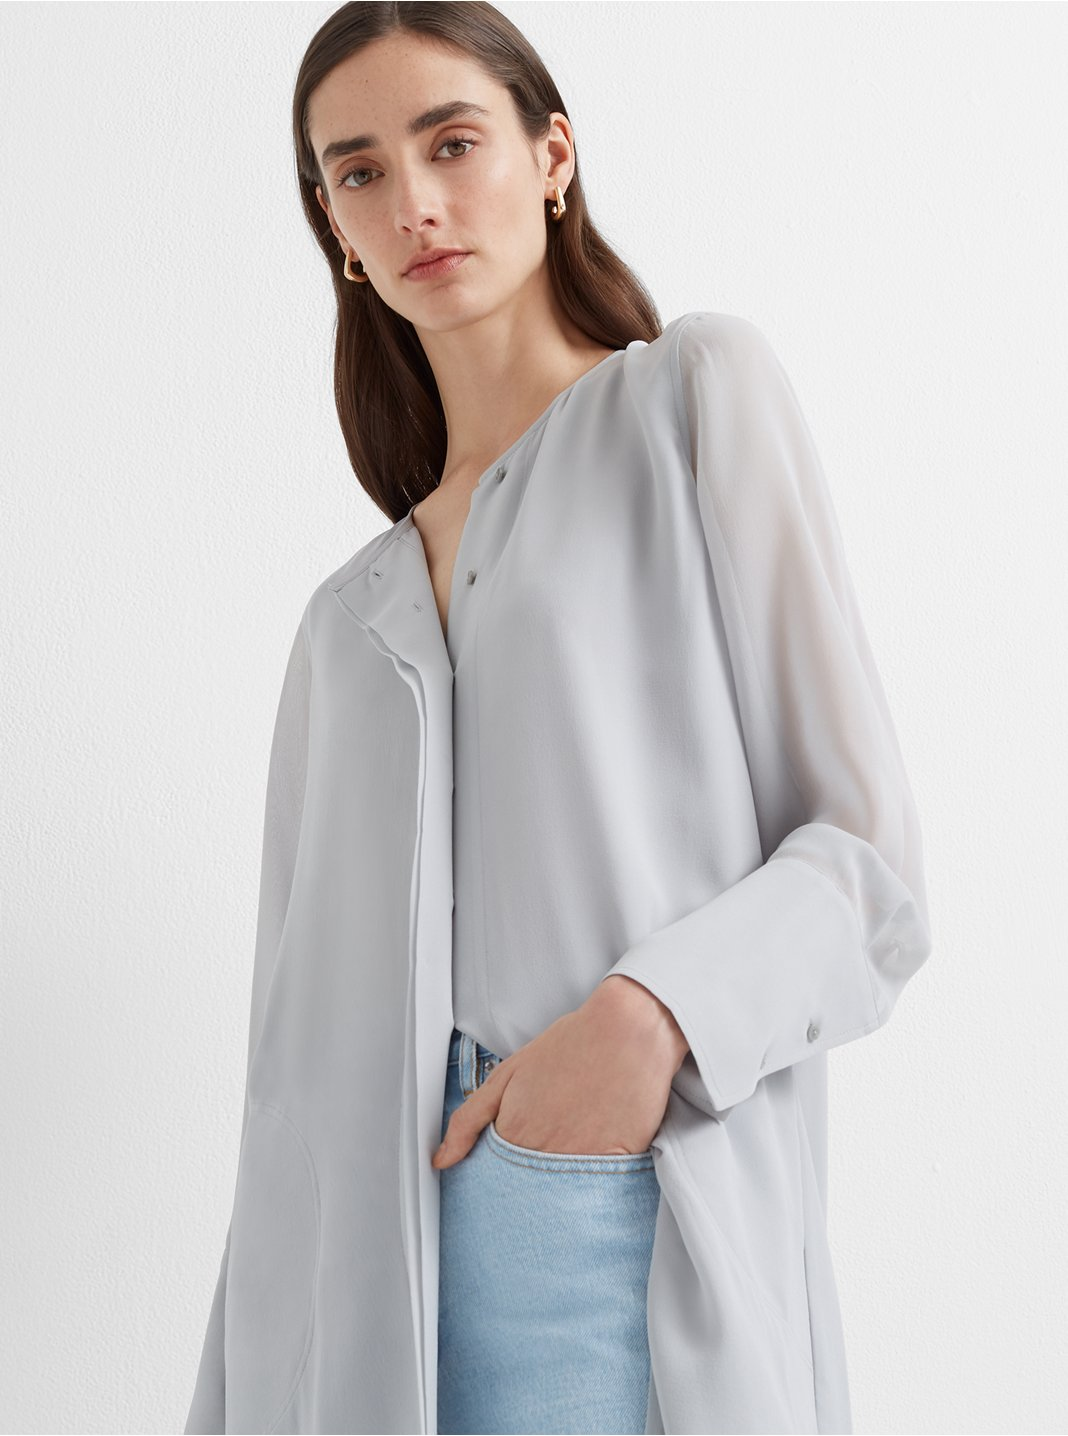 Shirttail Belted Dress